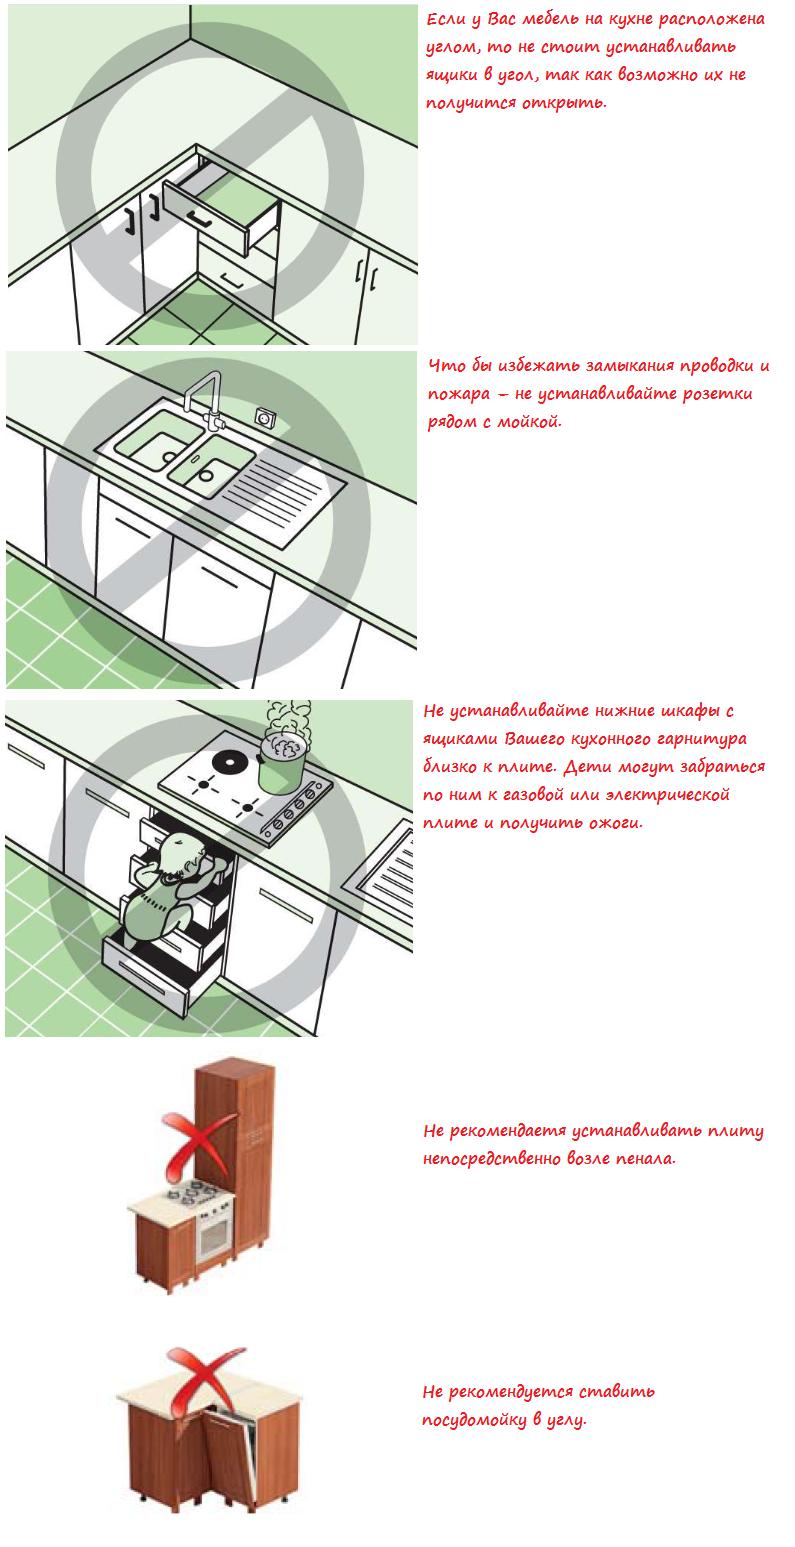 Модульна кухня Модест Garant Kuhni_sovety_ne_rekomend_big_4-4